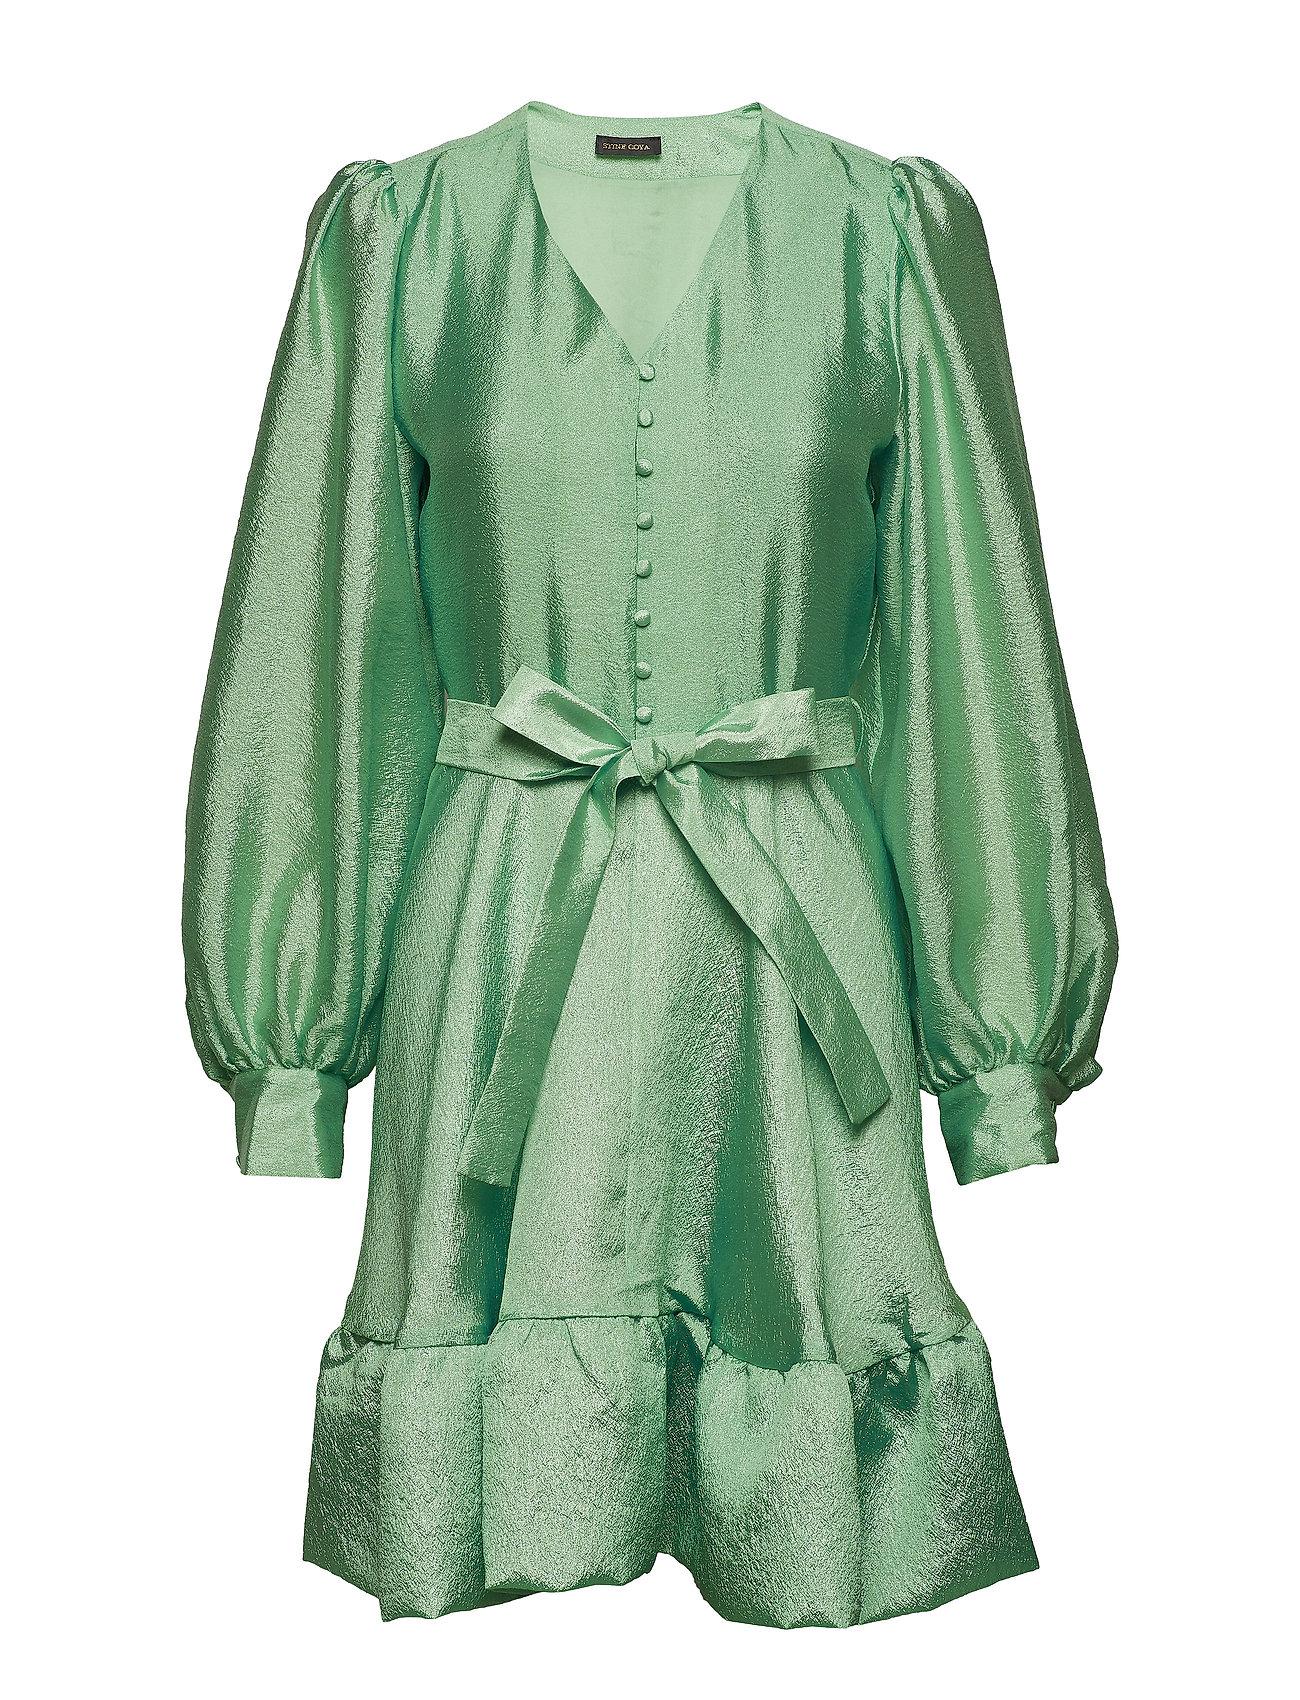 STINE GOYA Farrow, 576 Textured Polyester - 1708 JADE